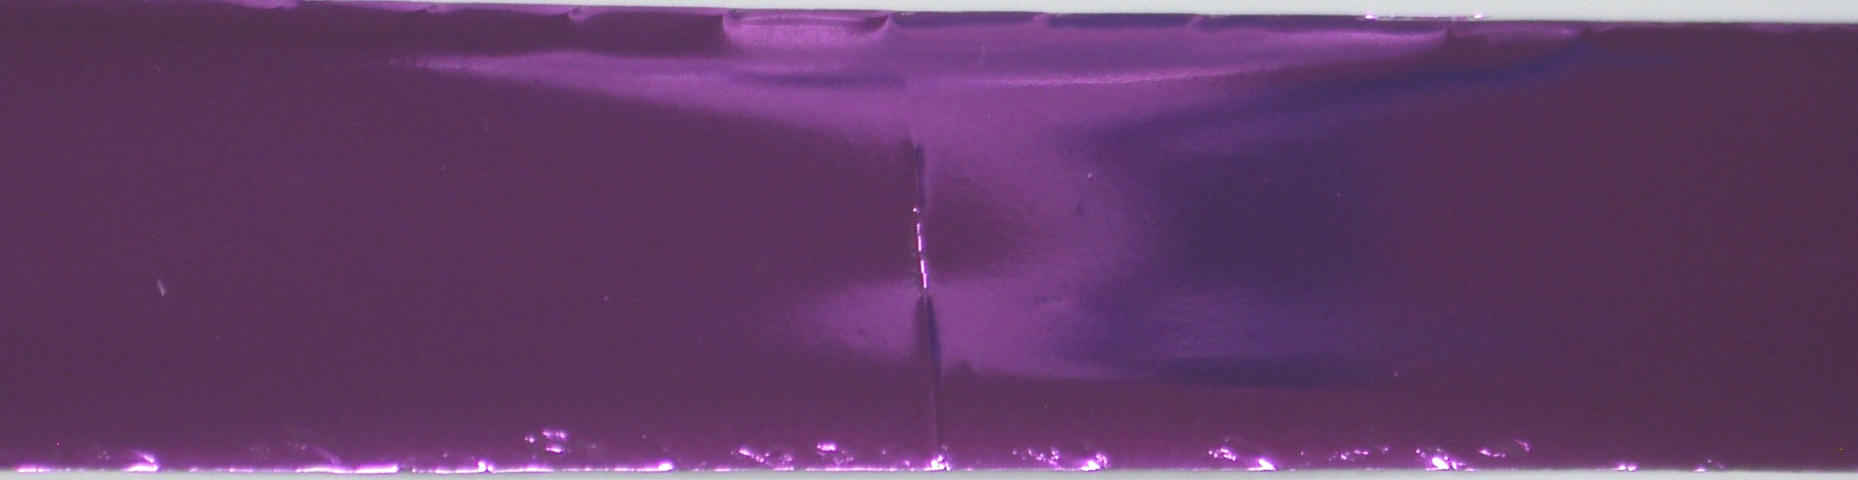 VIVI Folie na nehty hladká fialová 50 cm